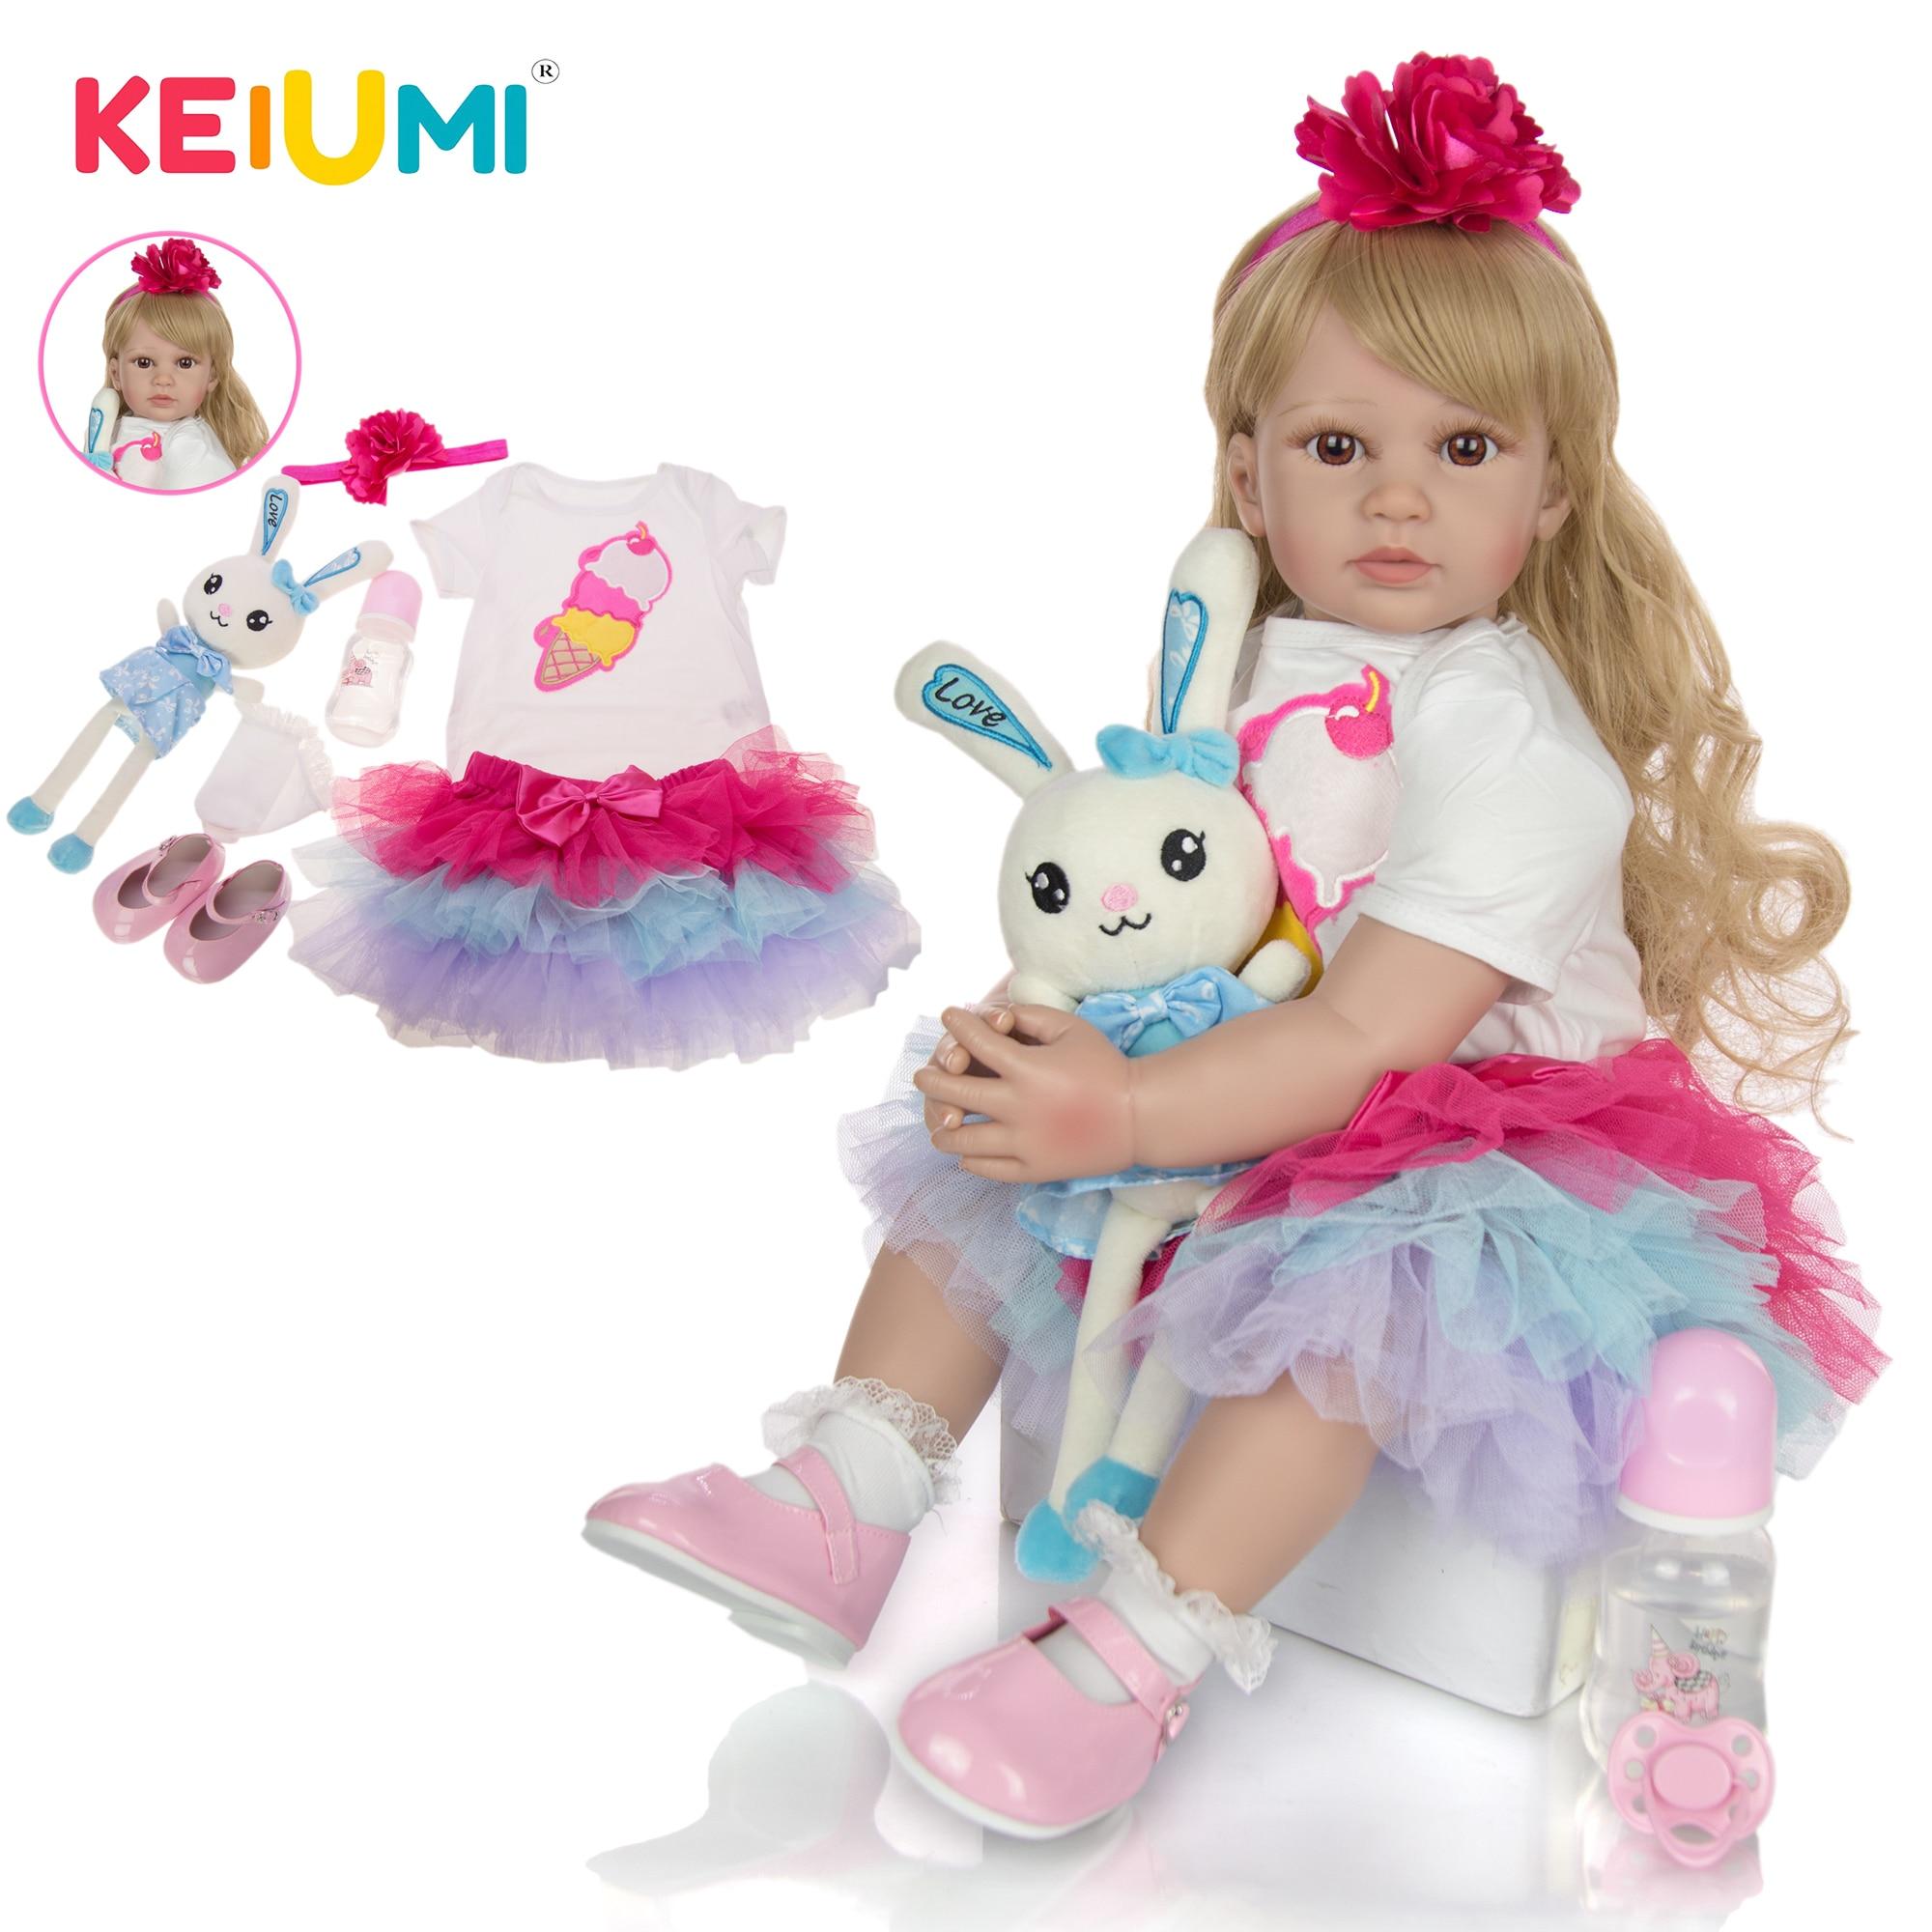 KEIUMI moda 24 pulgadas 60 cm muñecas Reborn bebé niña Real Princesa silicona con rizos largos de oro Reborns para regalo gratis almohada de juguete